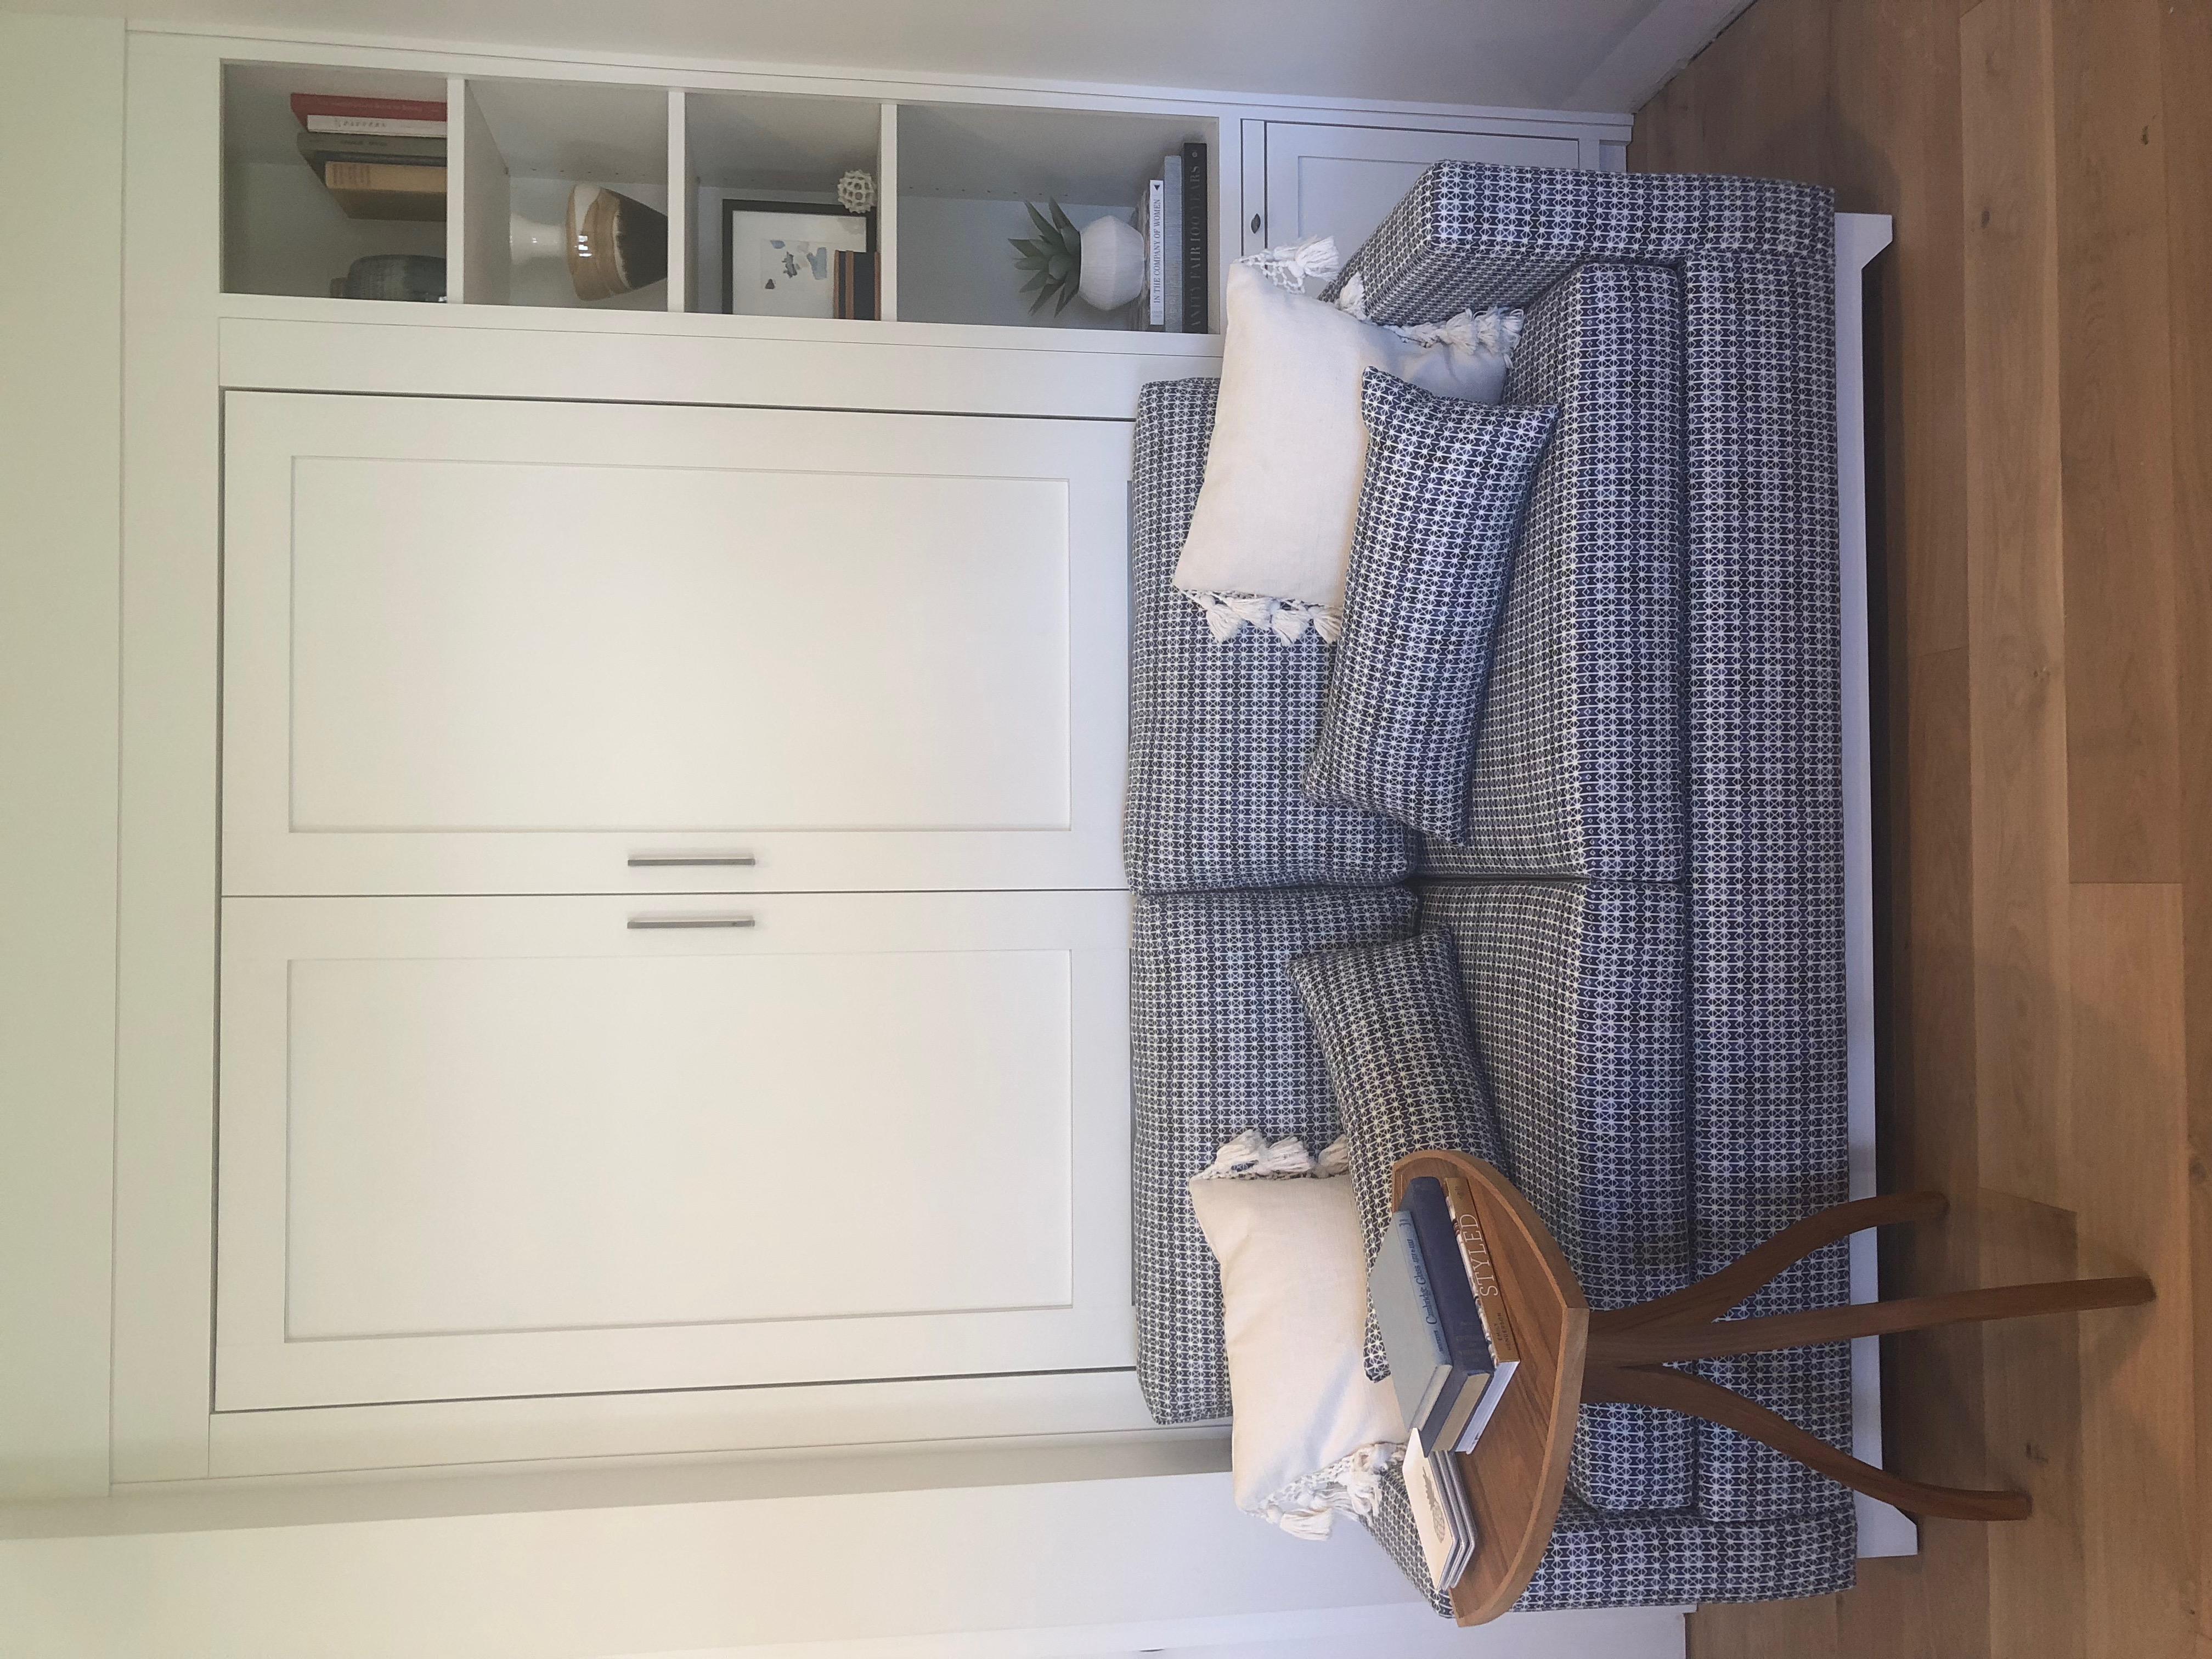 MURPHY BED WITH CUSTOM SOFA